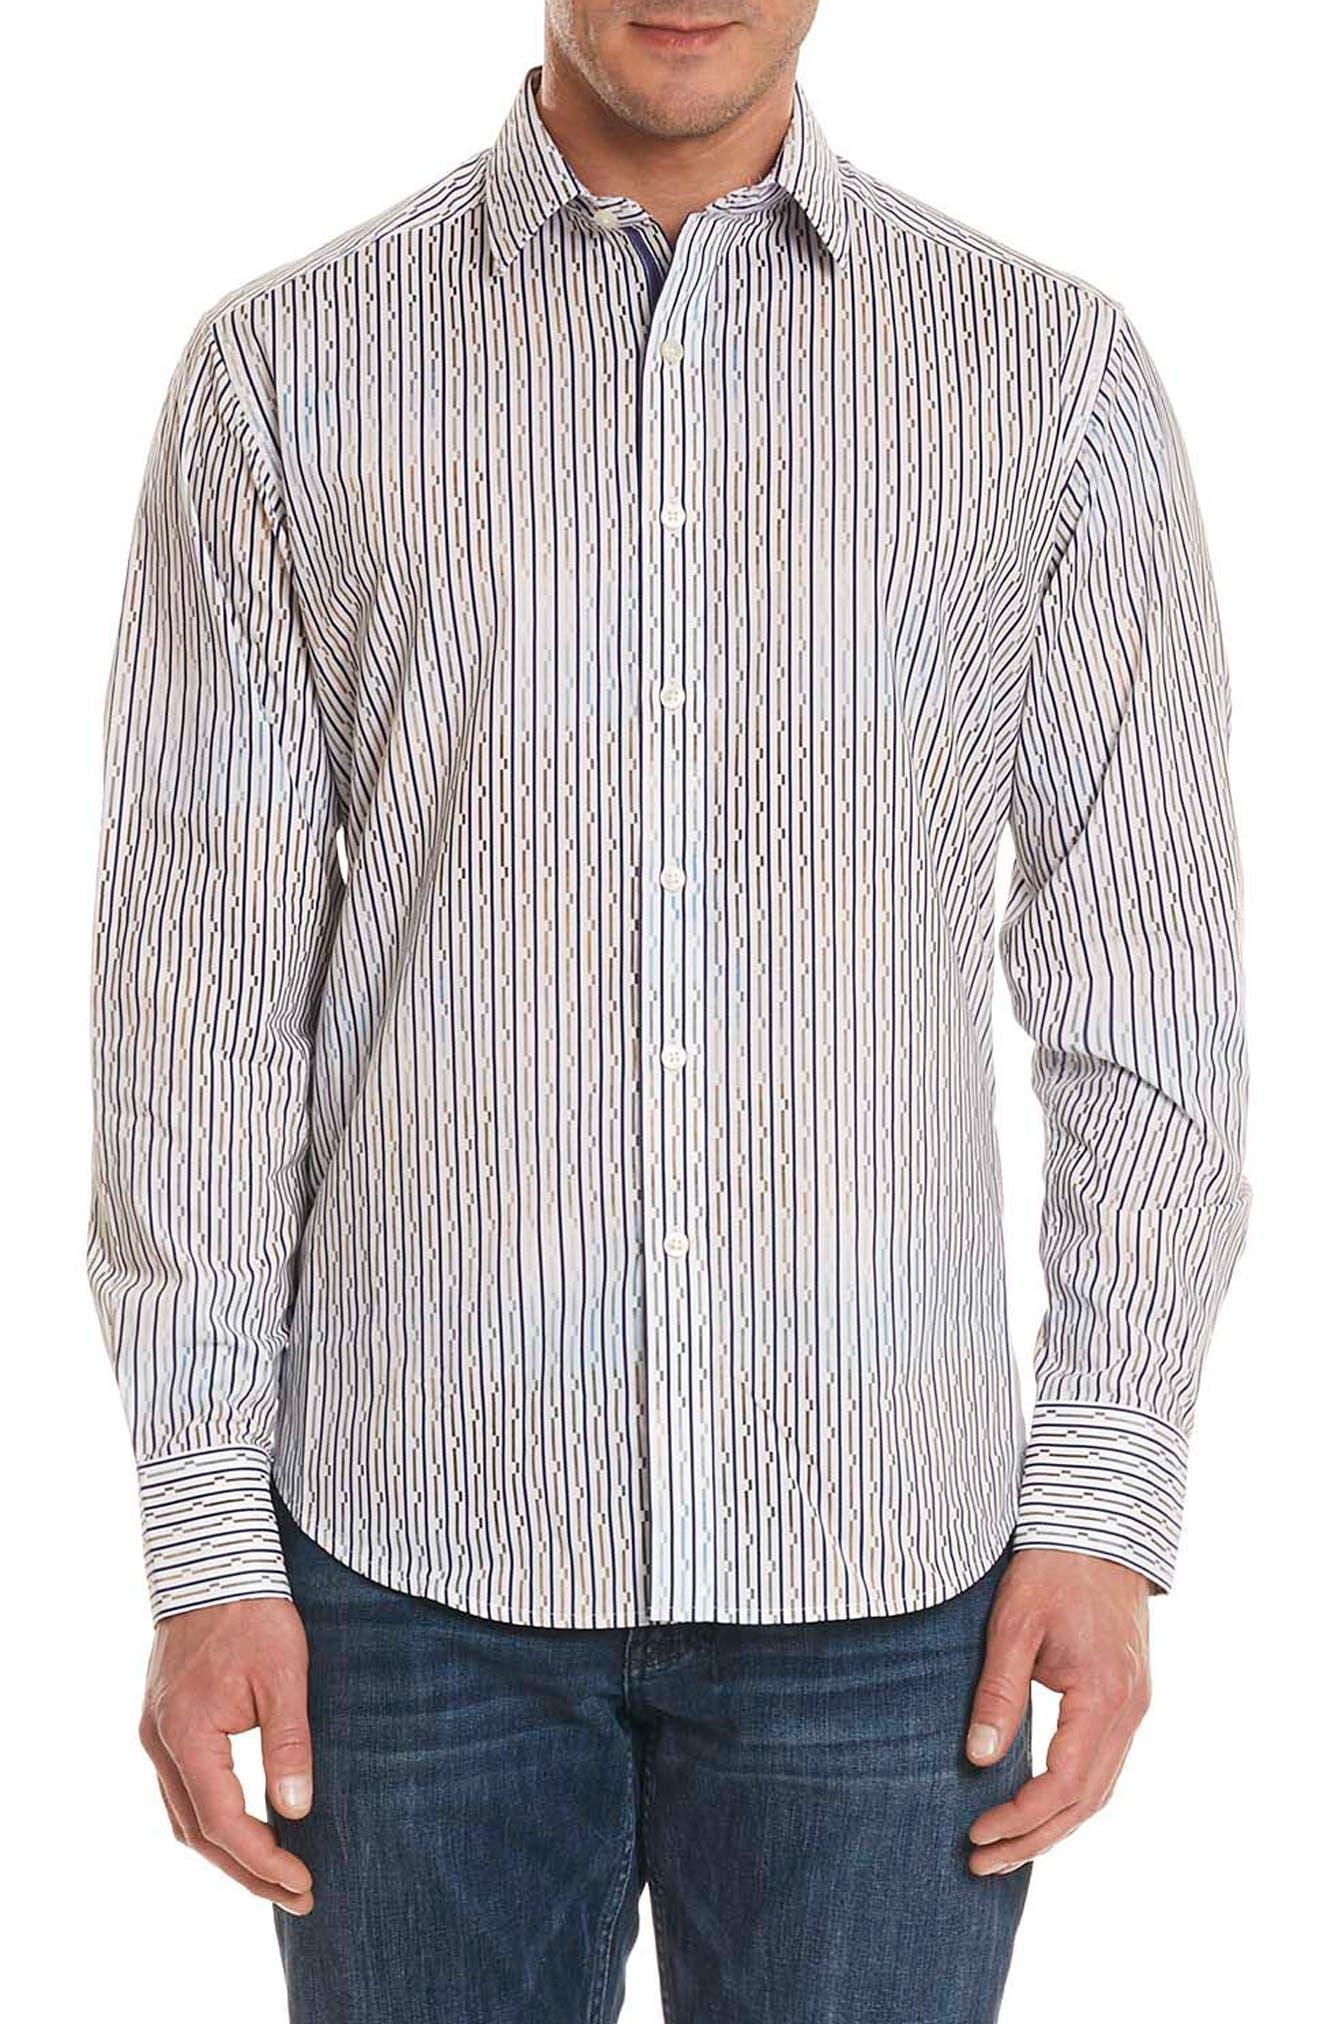 Trinidad Classic Fit Sport Shirt,                         Main,                         color, 278